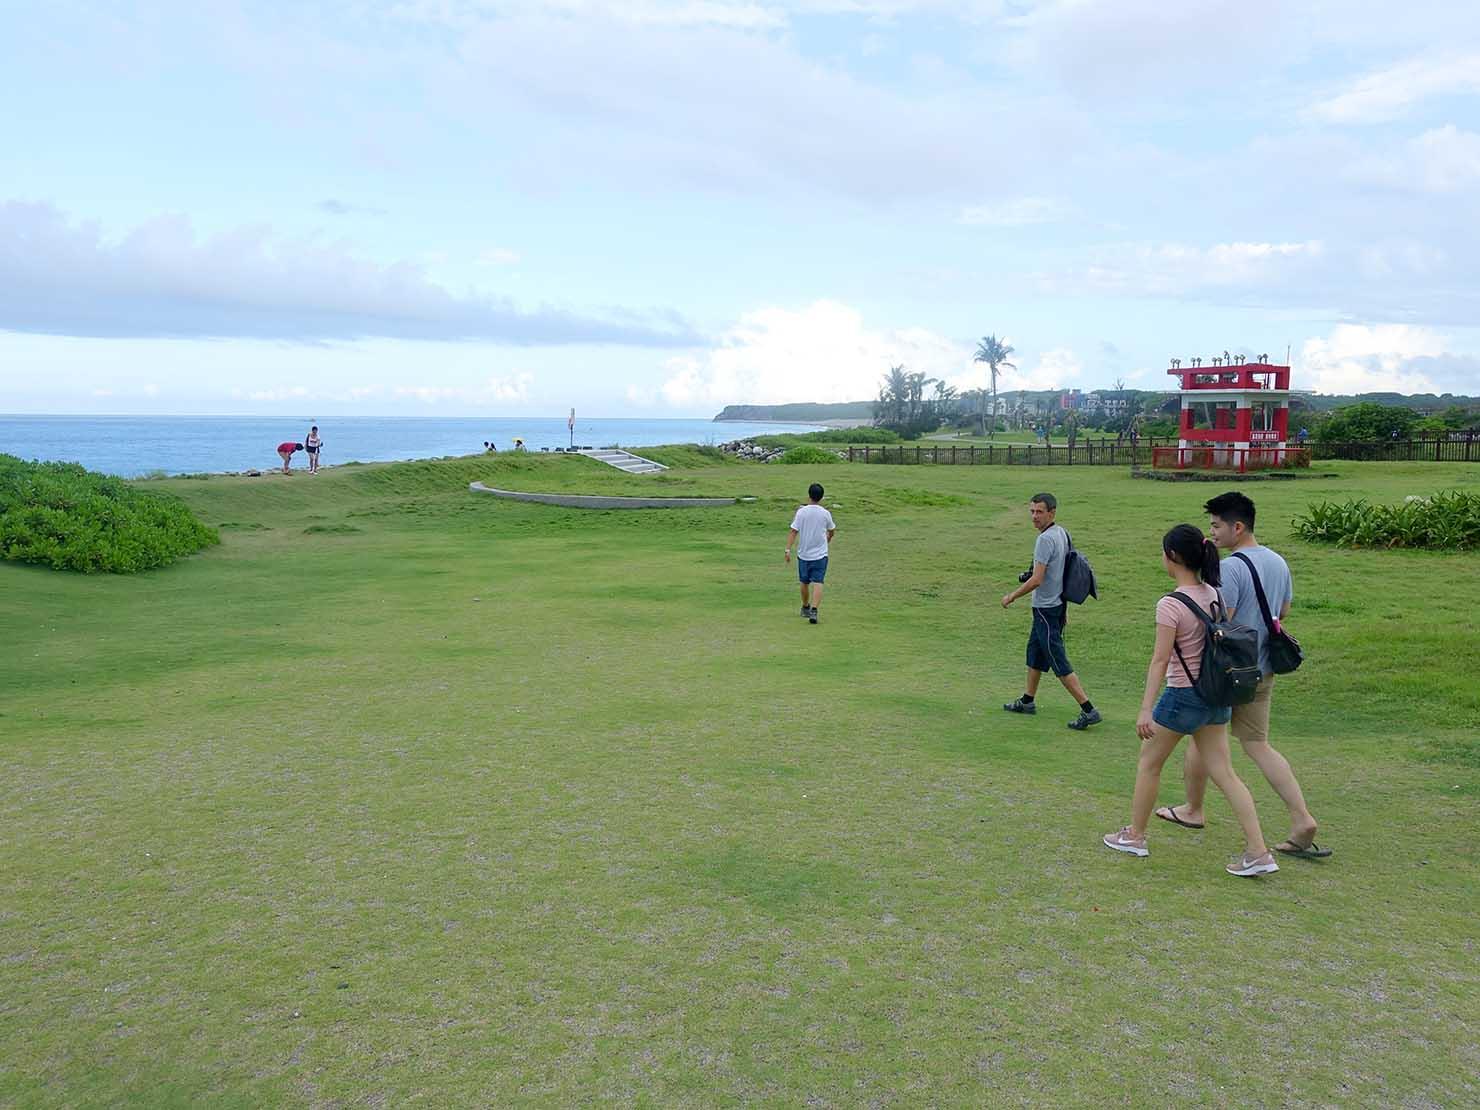 KKday外国人限定「花蓮・太魯閣(タロコ)日帰りツアー」七星潭に広がる芝生の広場